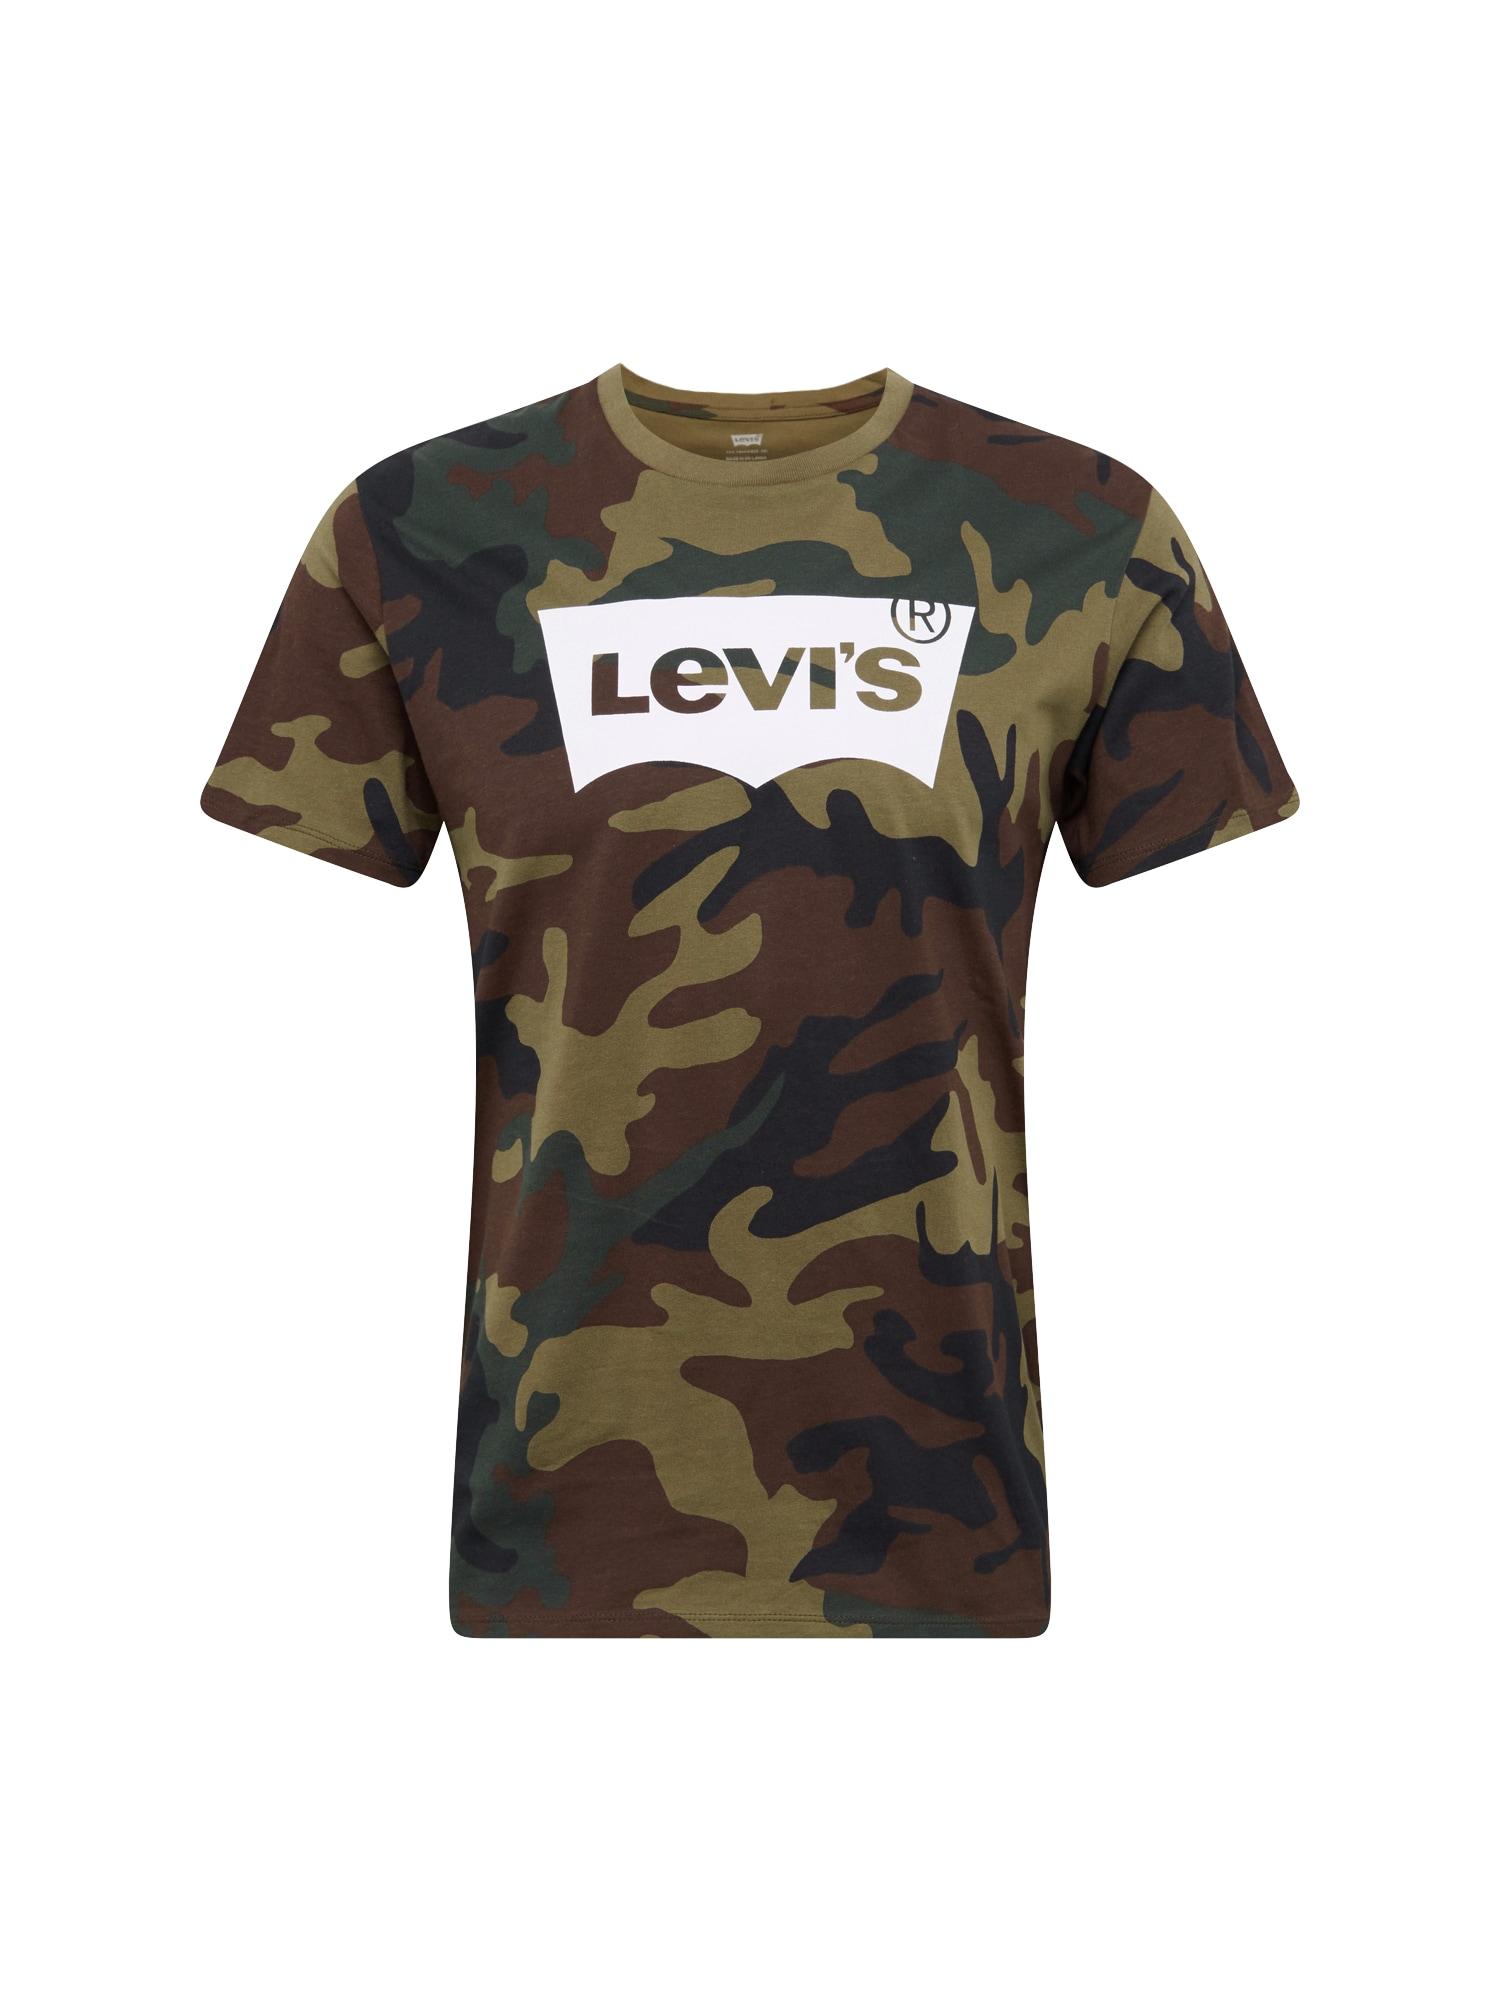 LEVIS Tričko HOUSEMARK GRAPHIC TEE tmavě zelená černá bílá LEVI'S